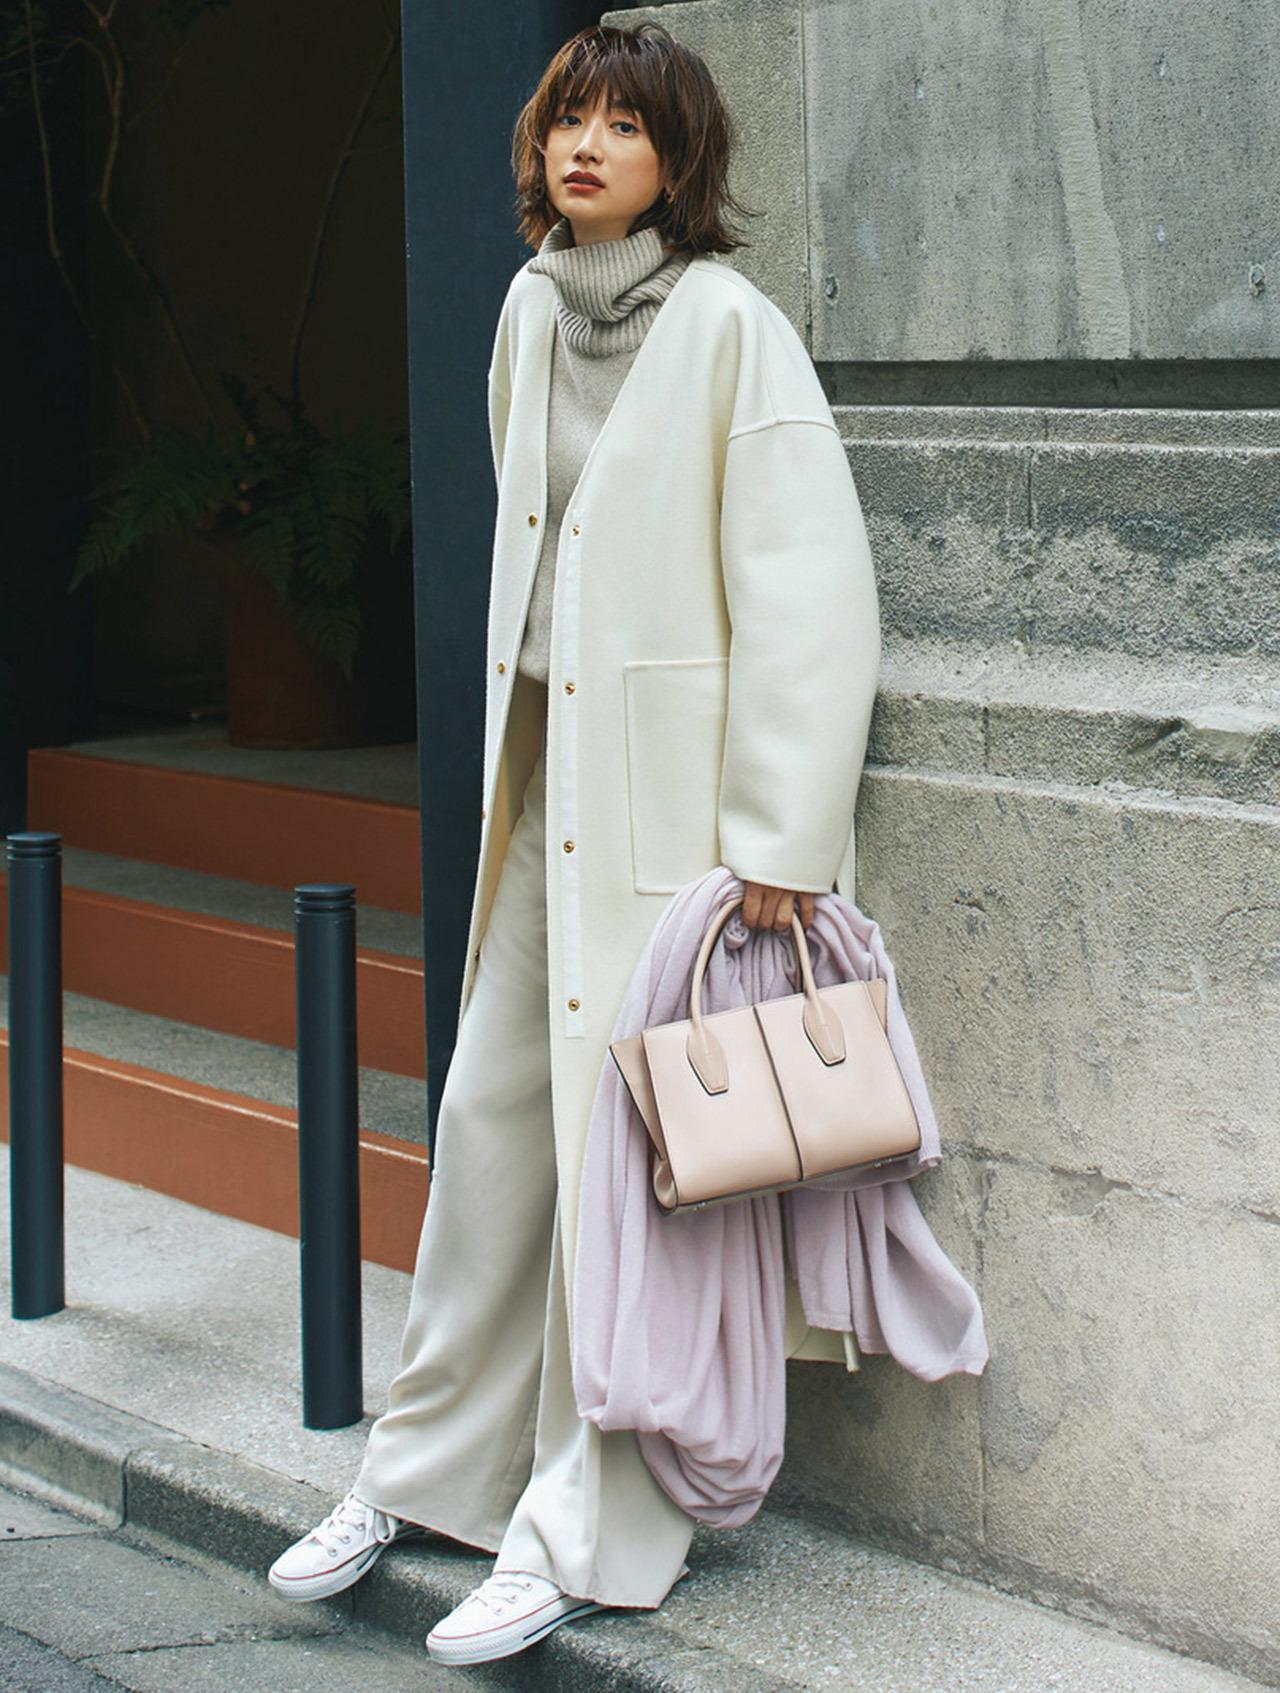 Style 4. オフホワイトコート×白コンバース